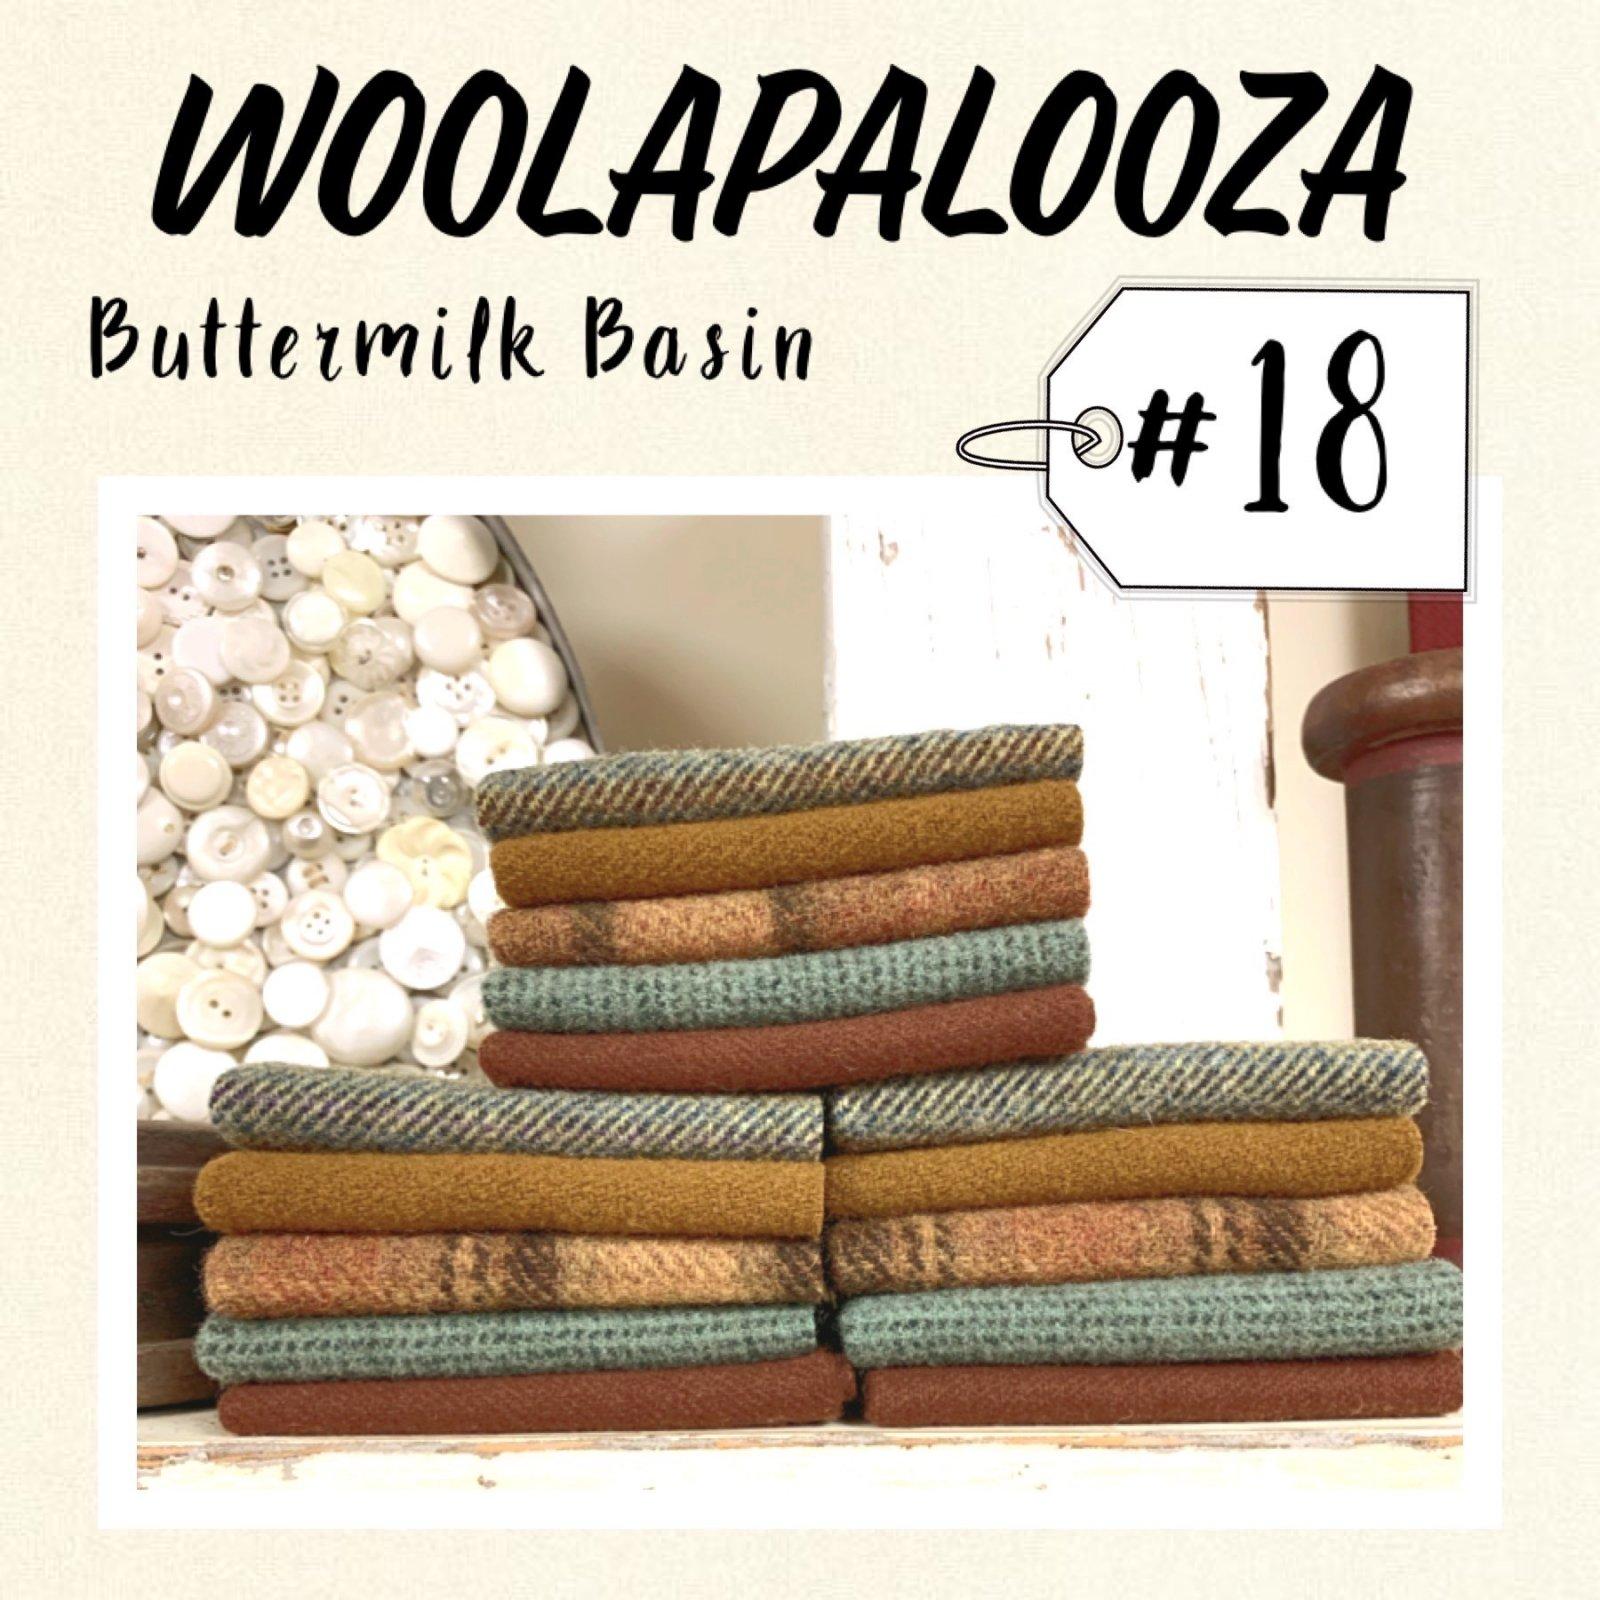 Woolapalooza #18 Wool Bundle